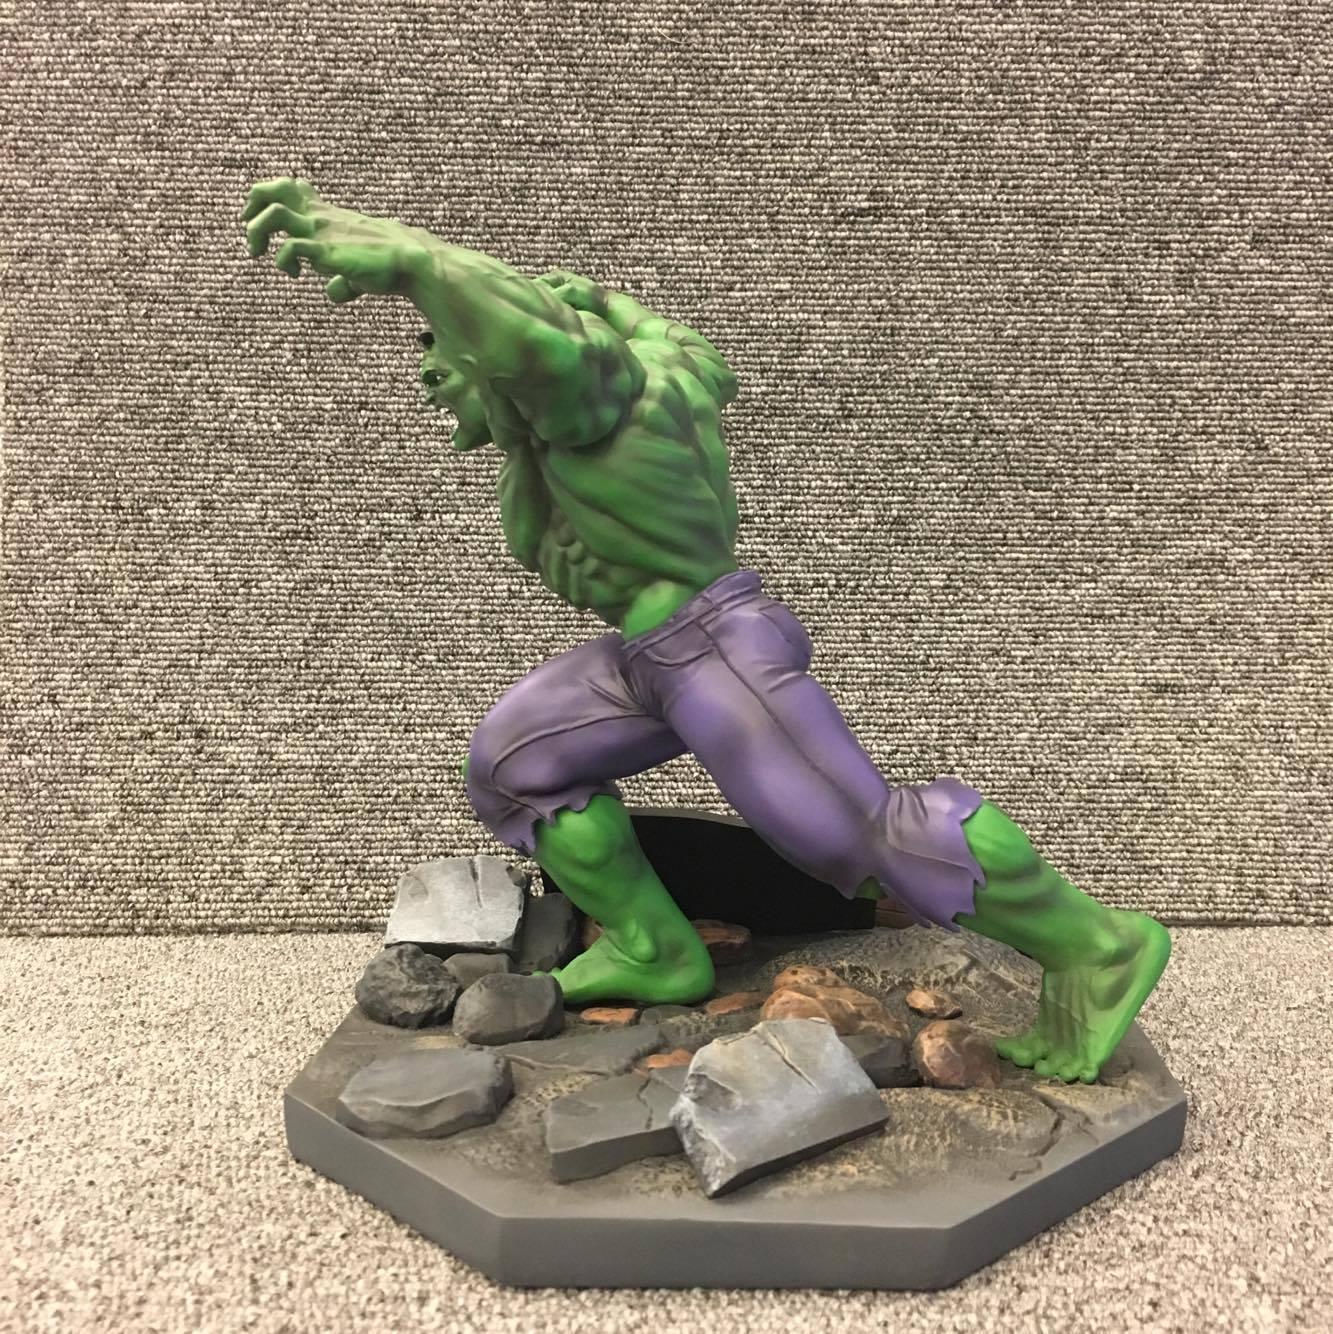 BEETLE 全新 BAIT x MARVEL HULK 綠巨人浩克 復仇者聯盟 公仔 玩偶 聖誕禮物 2